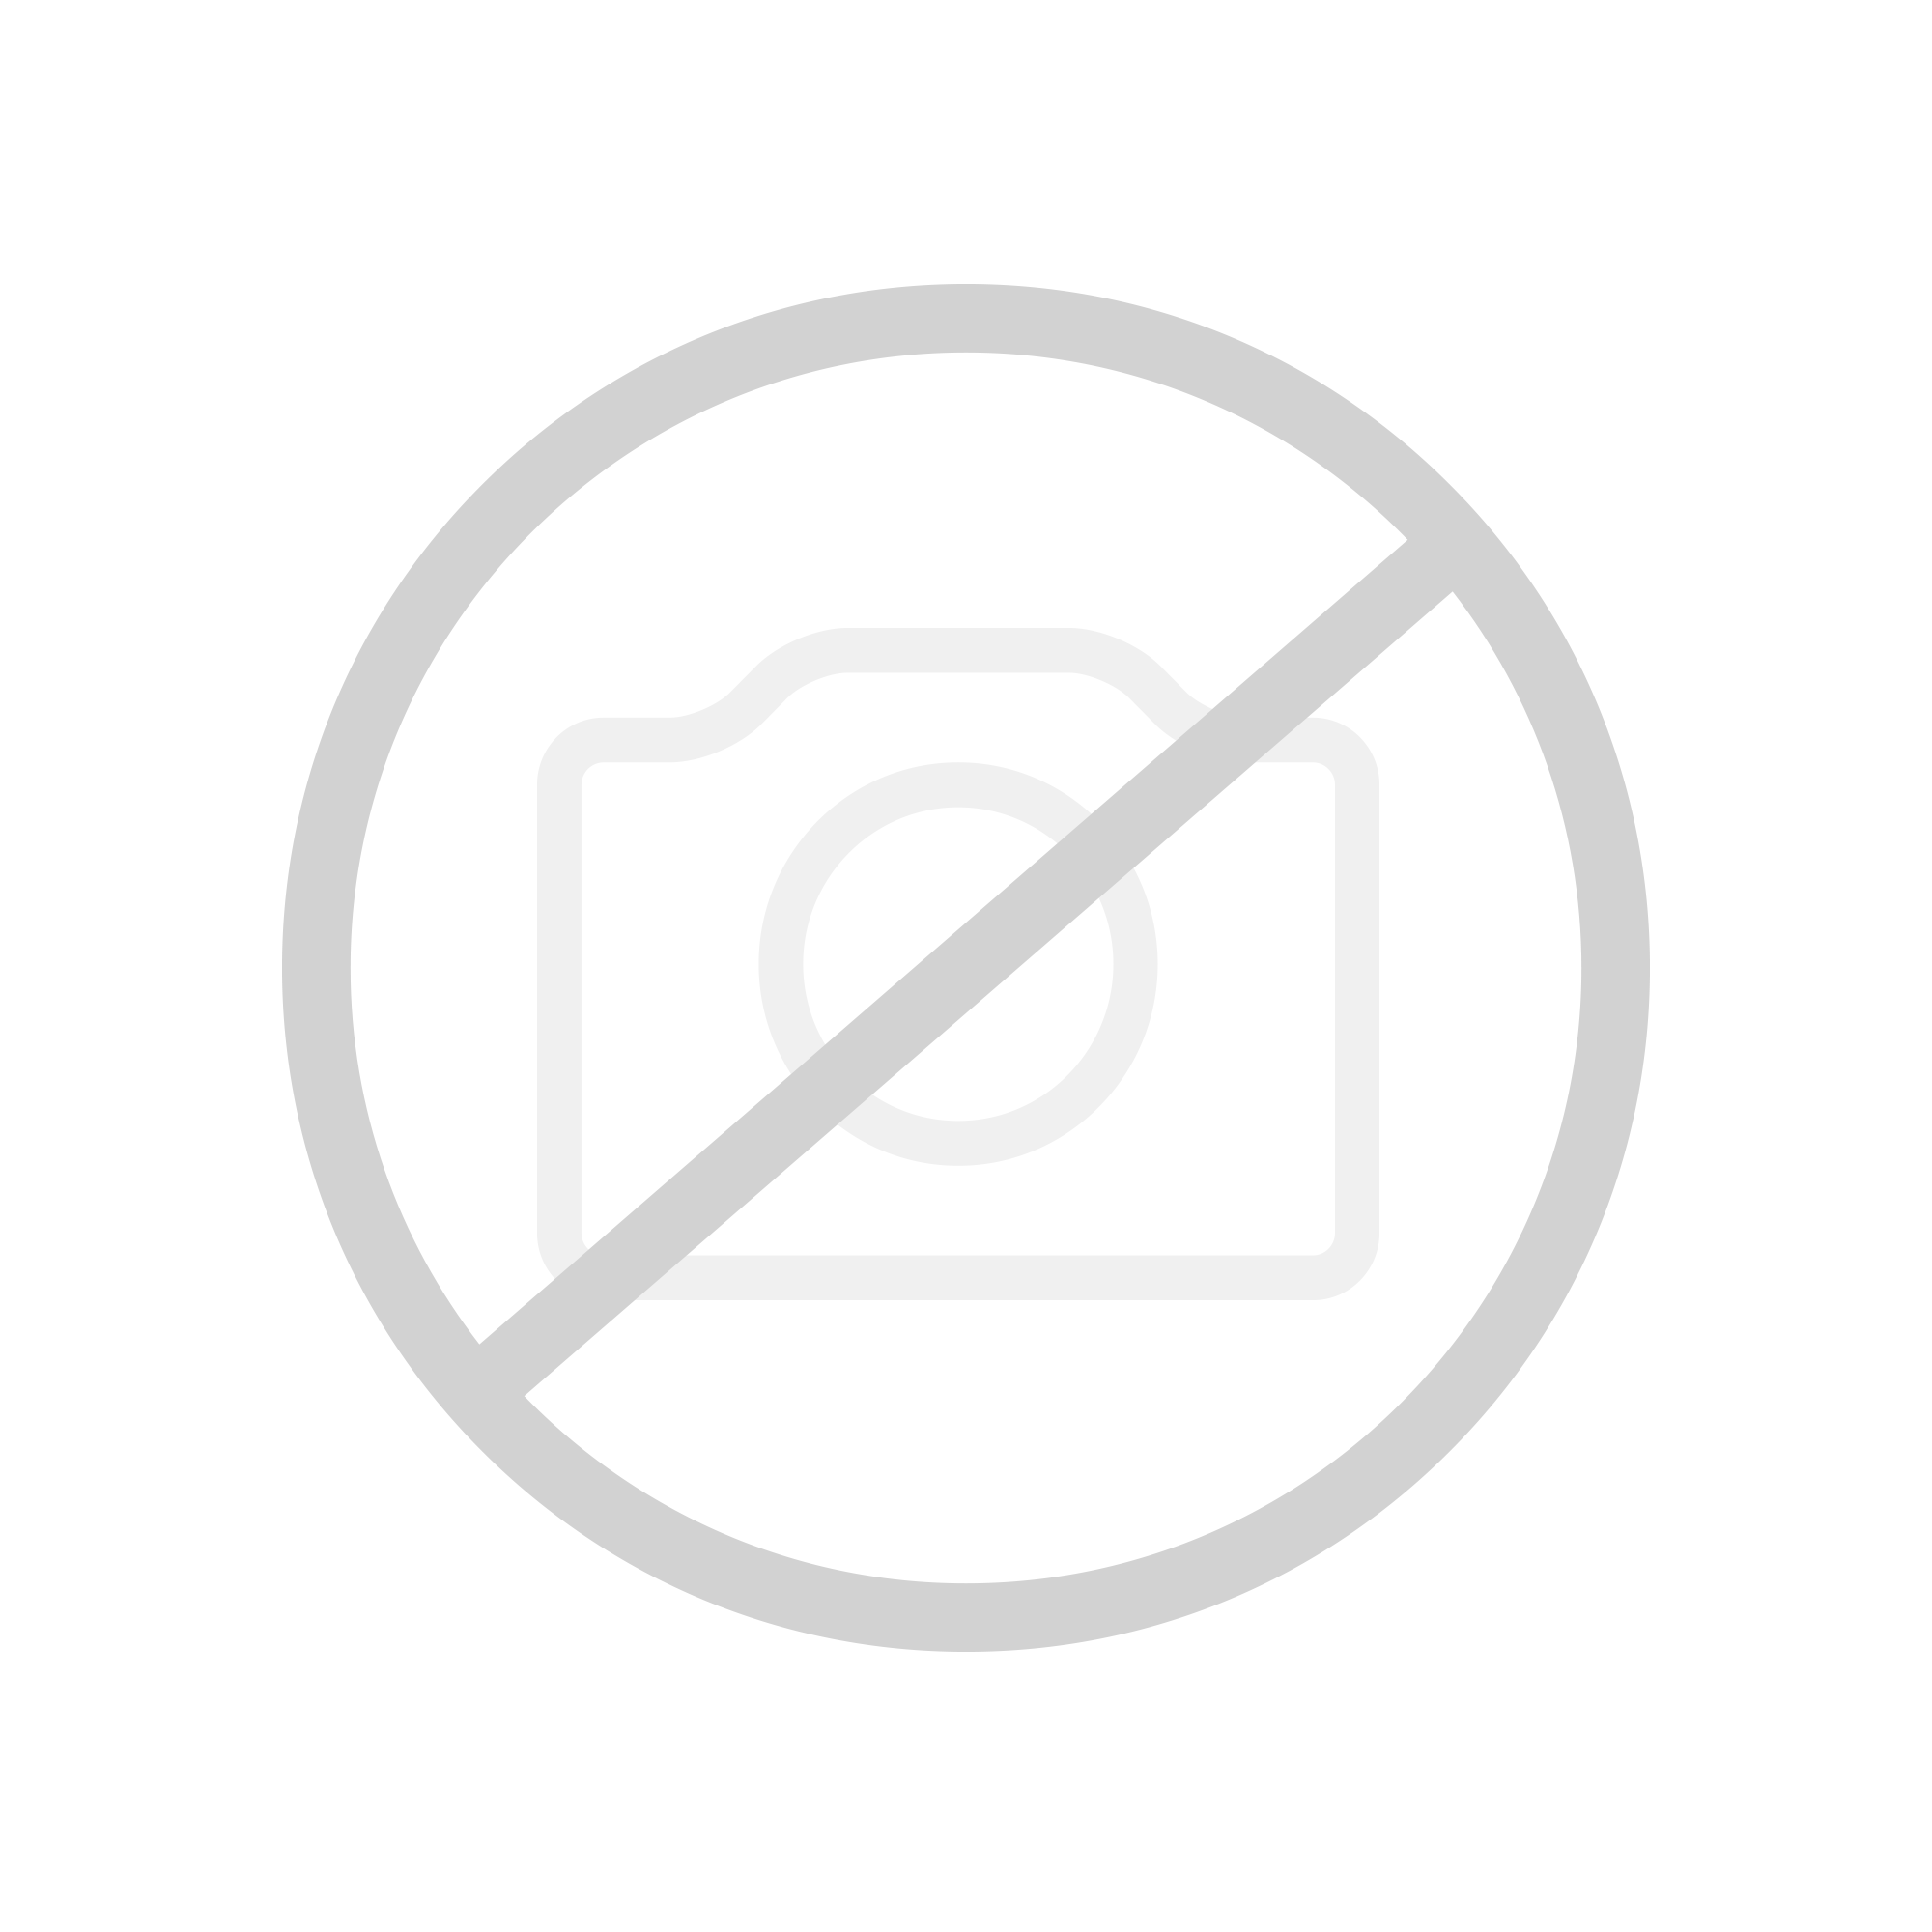 Freistehende Badewanne Armaturen - Carport 2017 | {Badewannen armaturen freistehend 1}